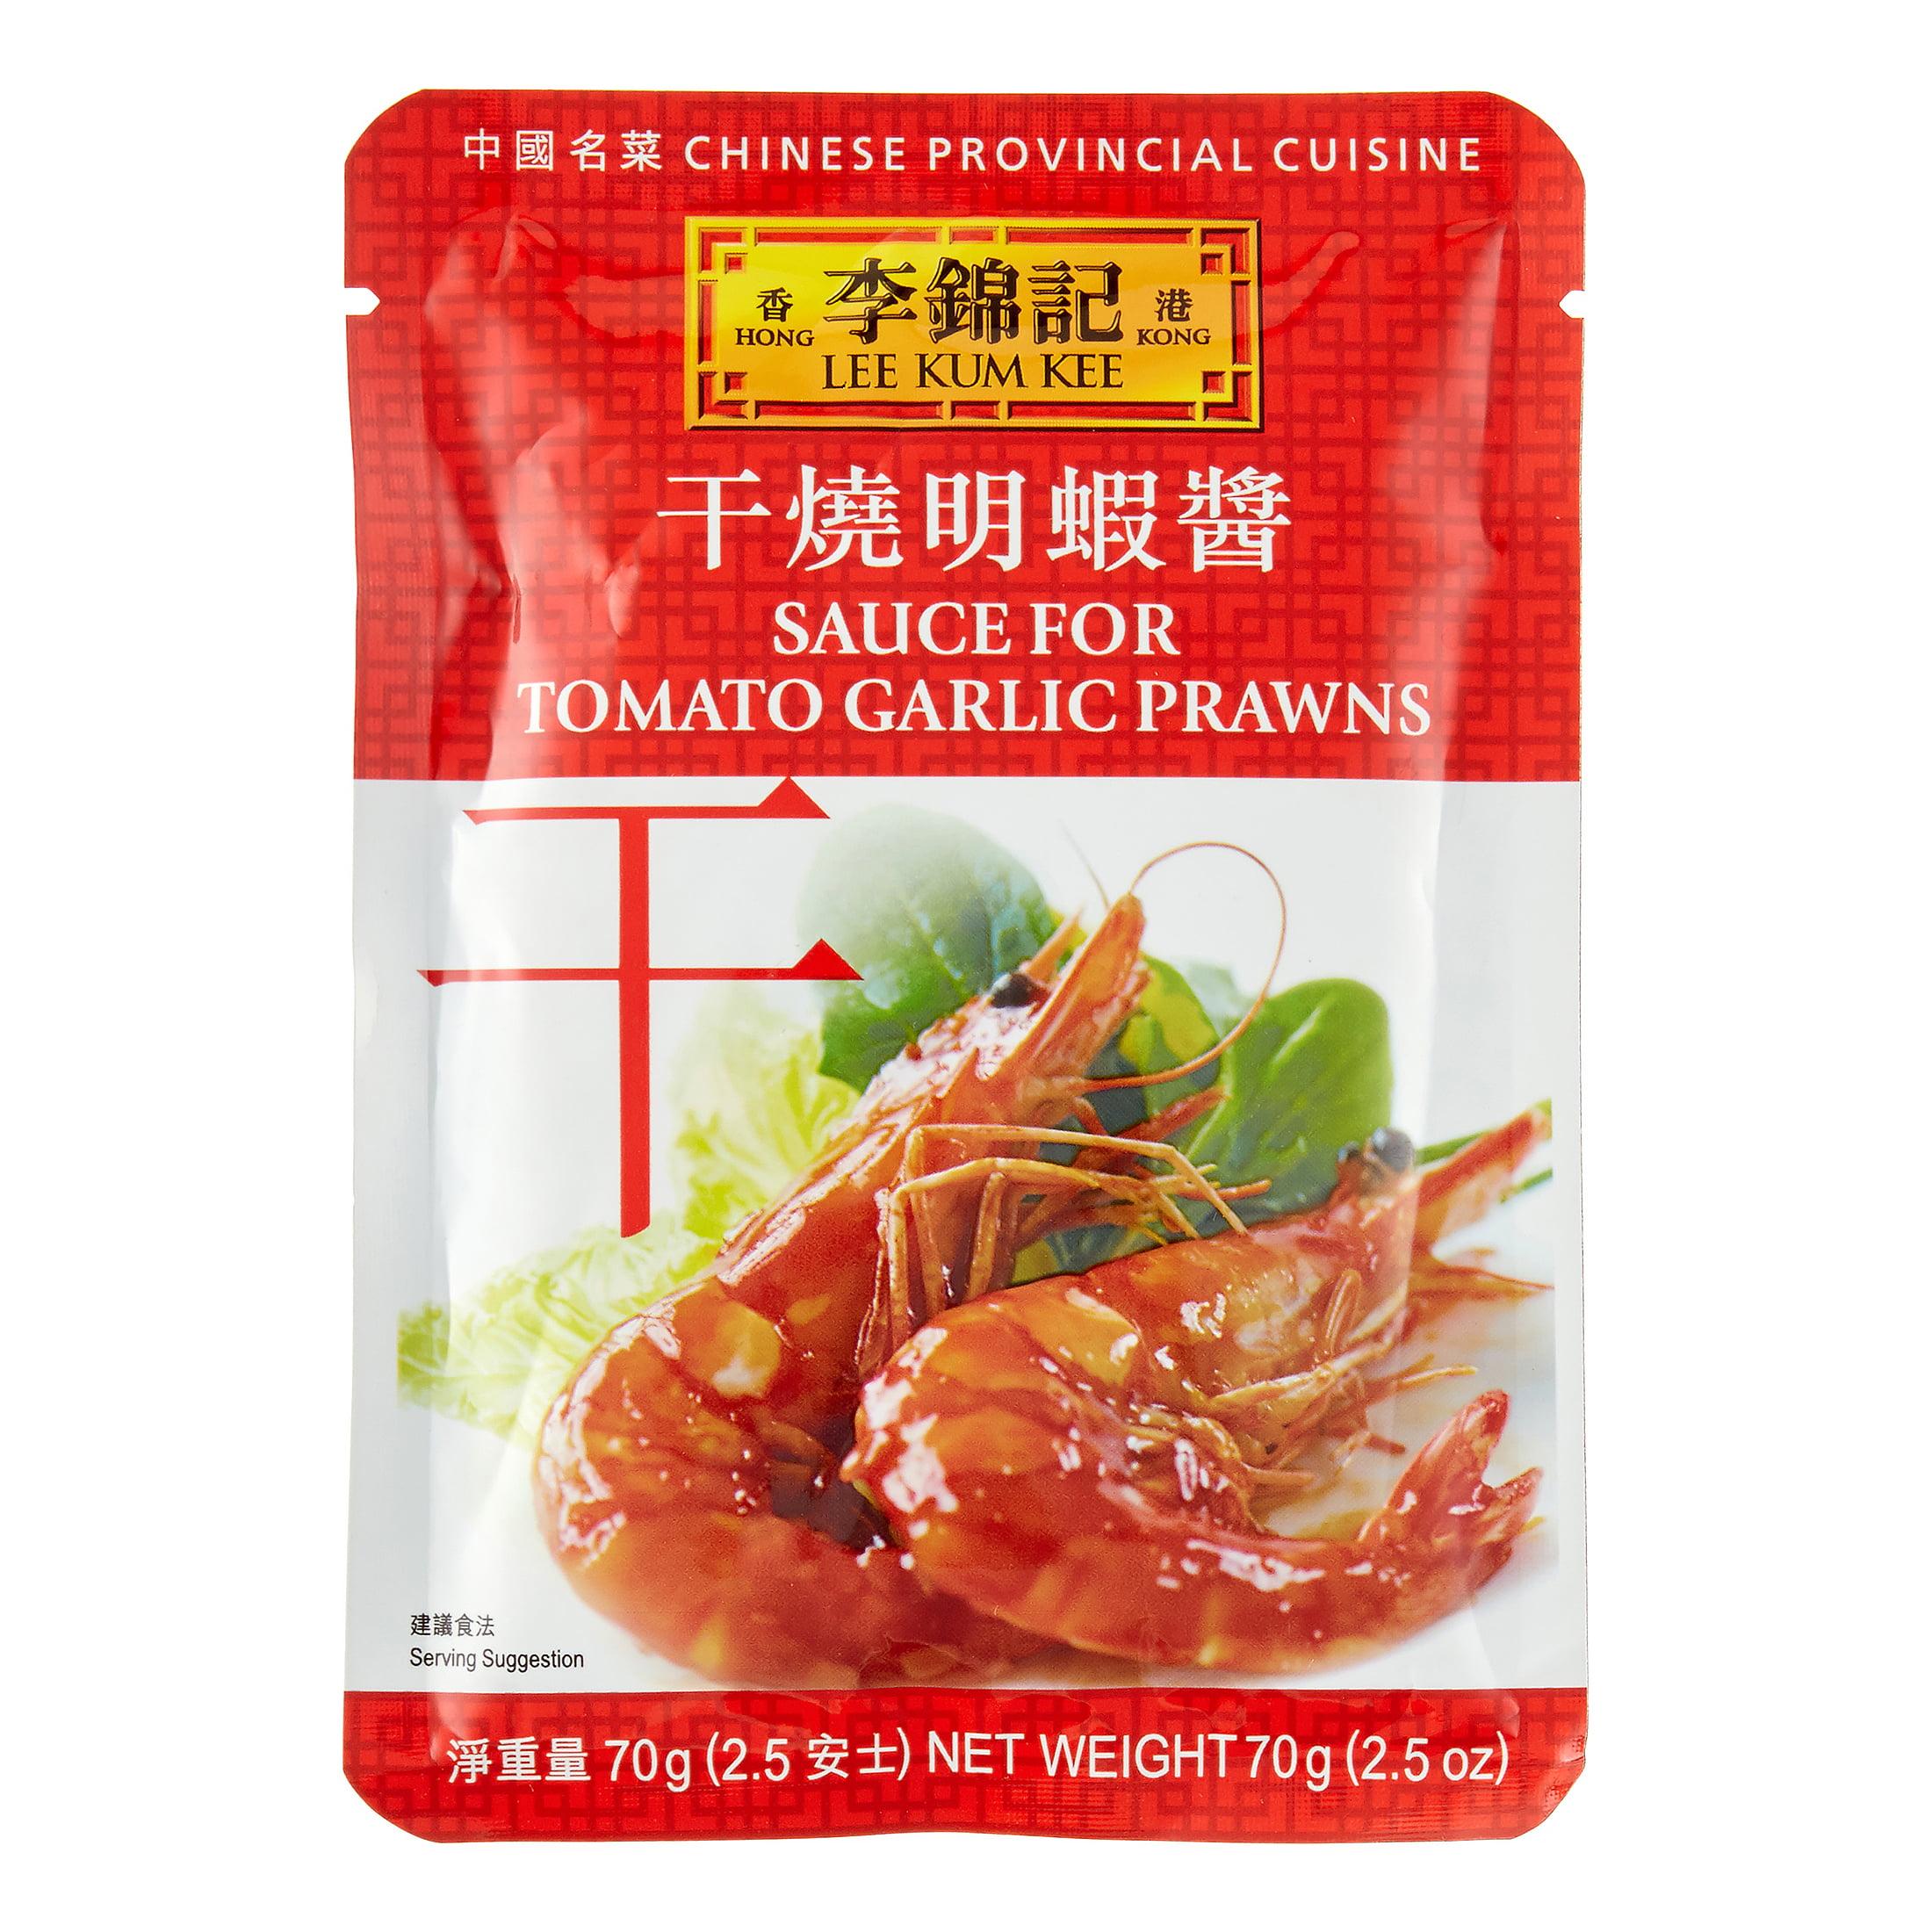 Lee Kum Kee Sauce For Tomato Garlic Prawns, 2.5 oz by Lee Kum Kee